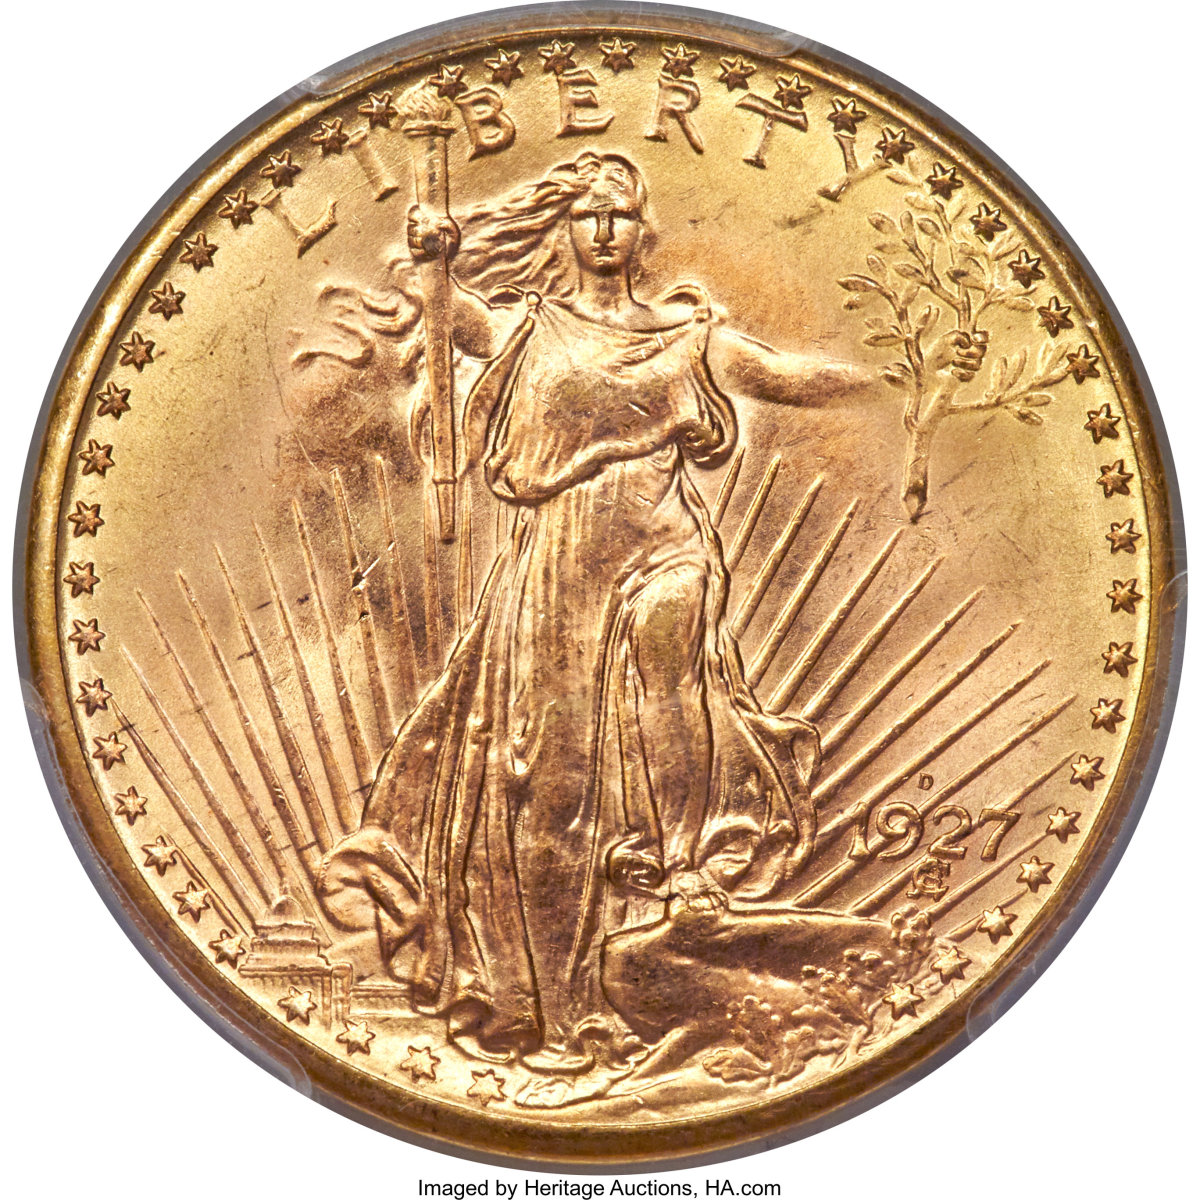 The 1927-D Saint-Gaudens double eagle. (Images courtesy Heritage Auctions.)